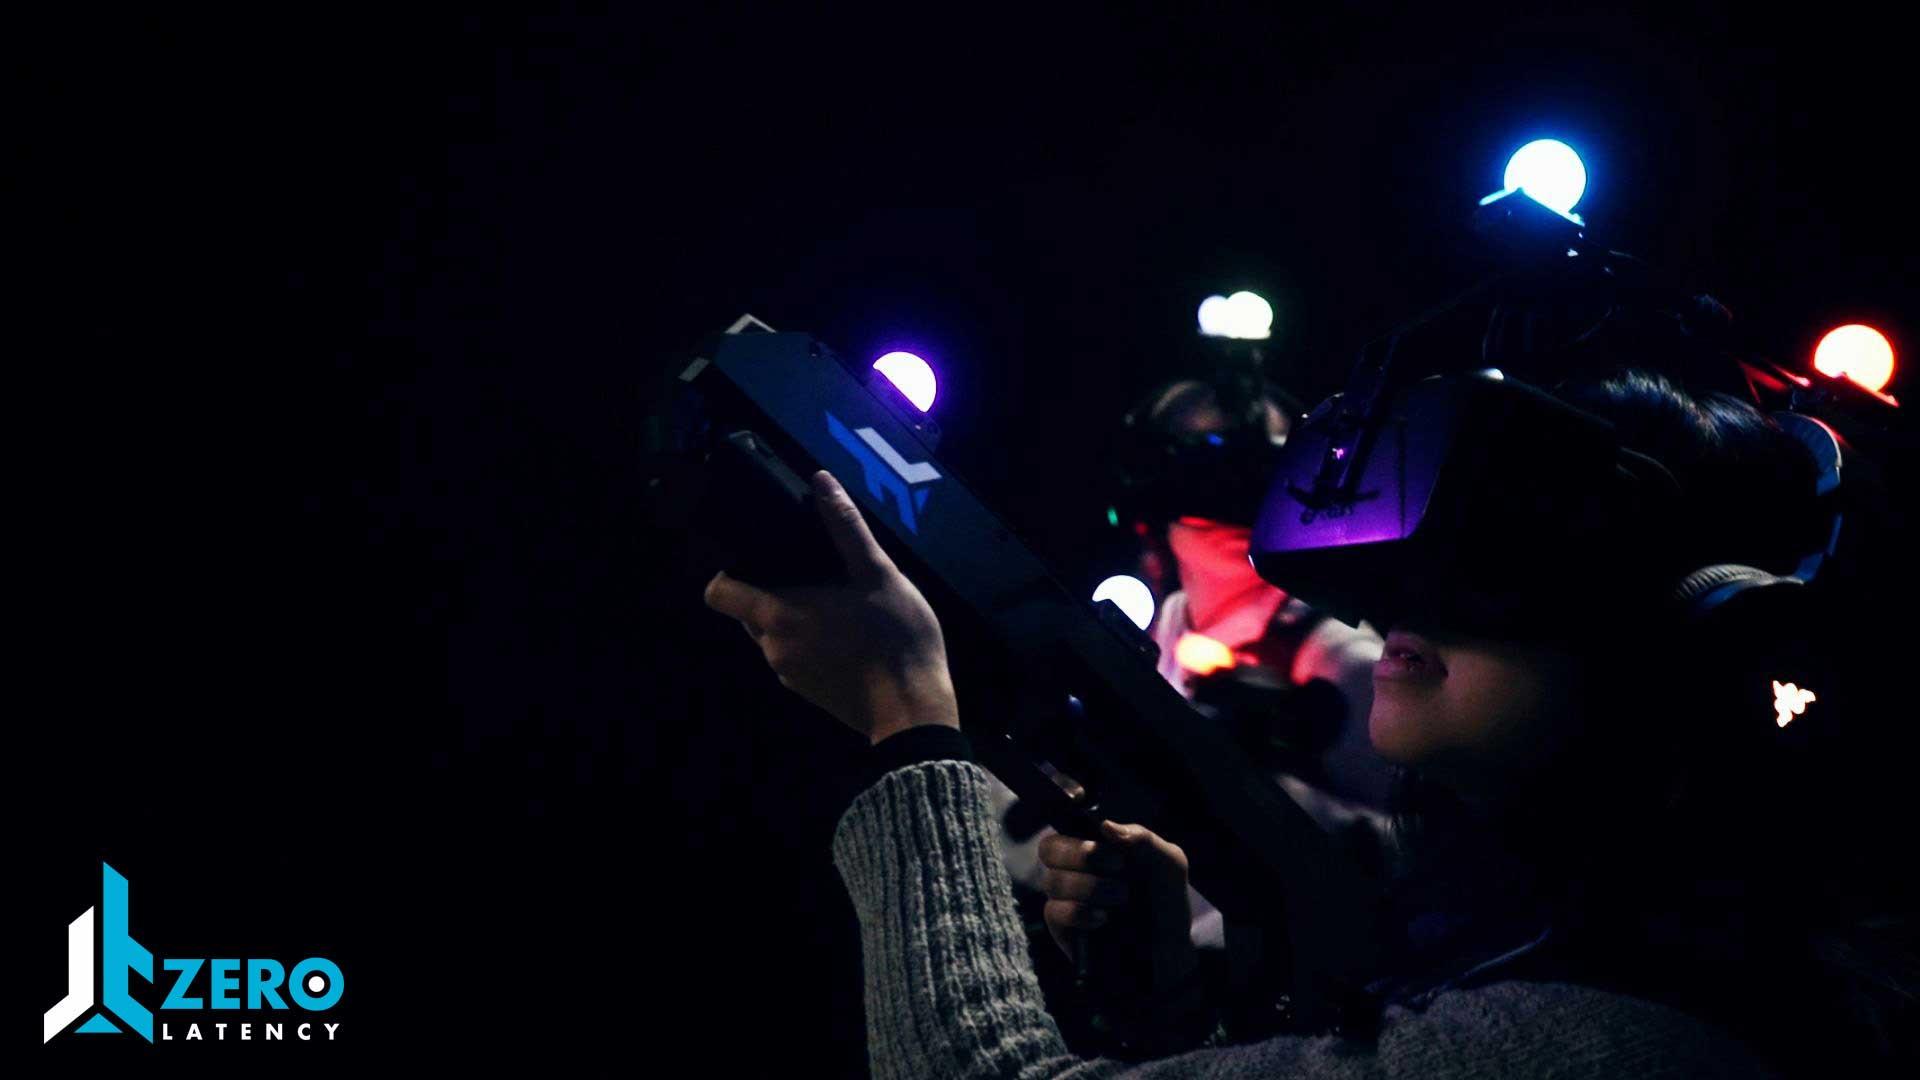 Zero Latency VR survival Brisbane